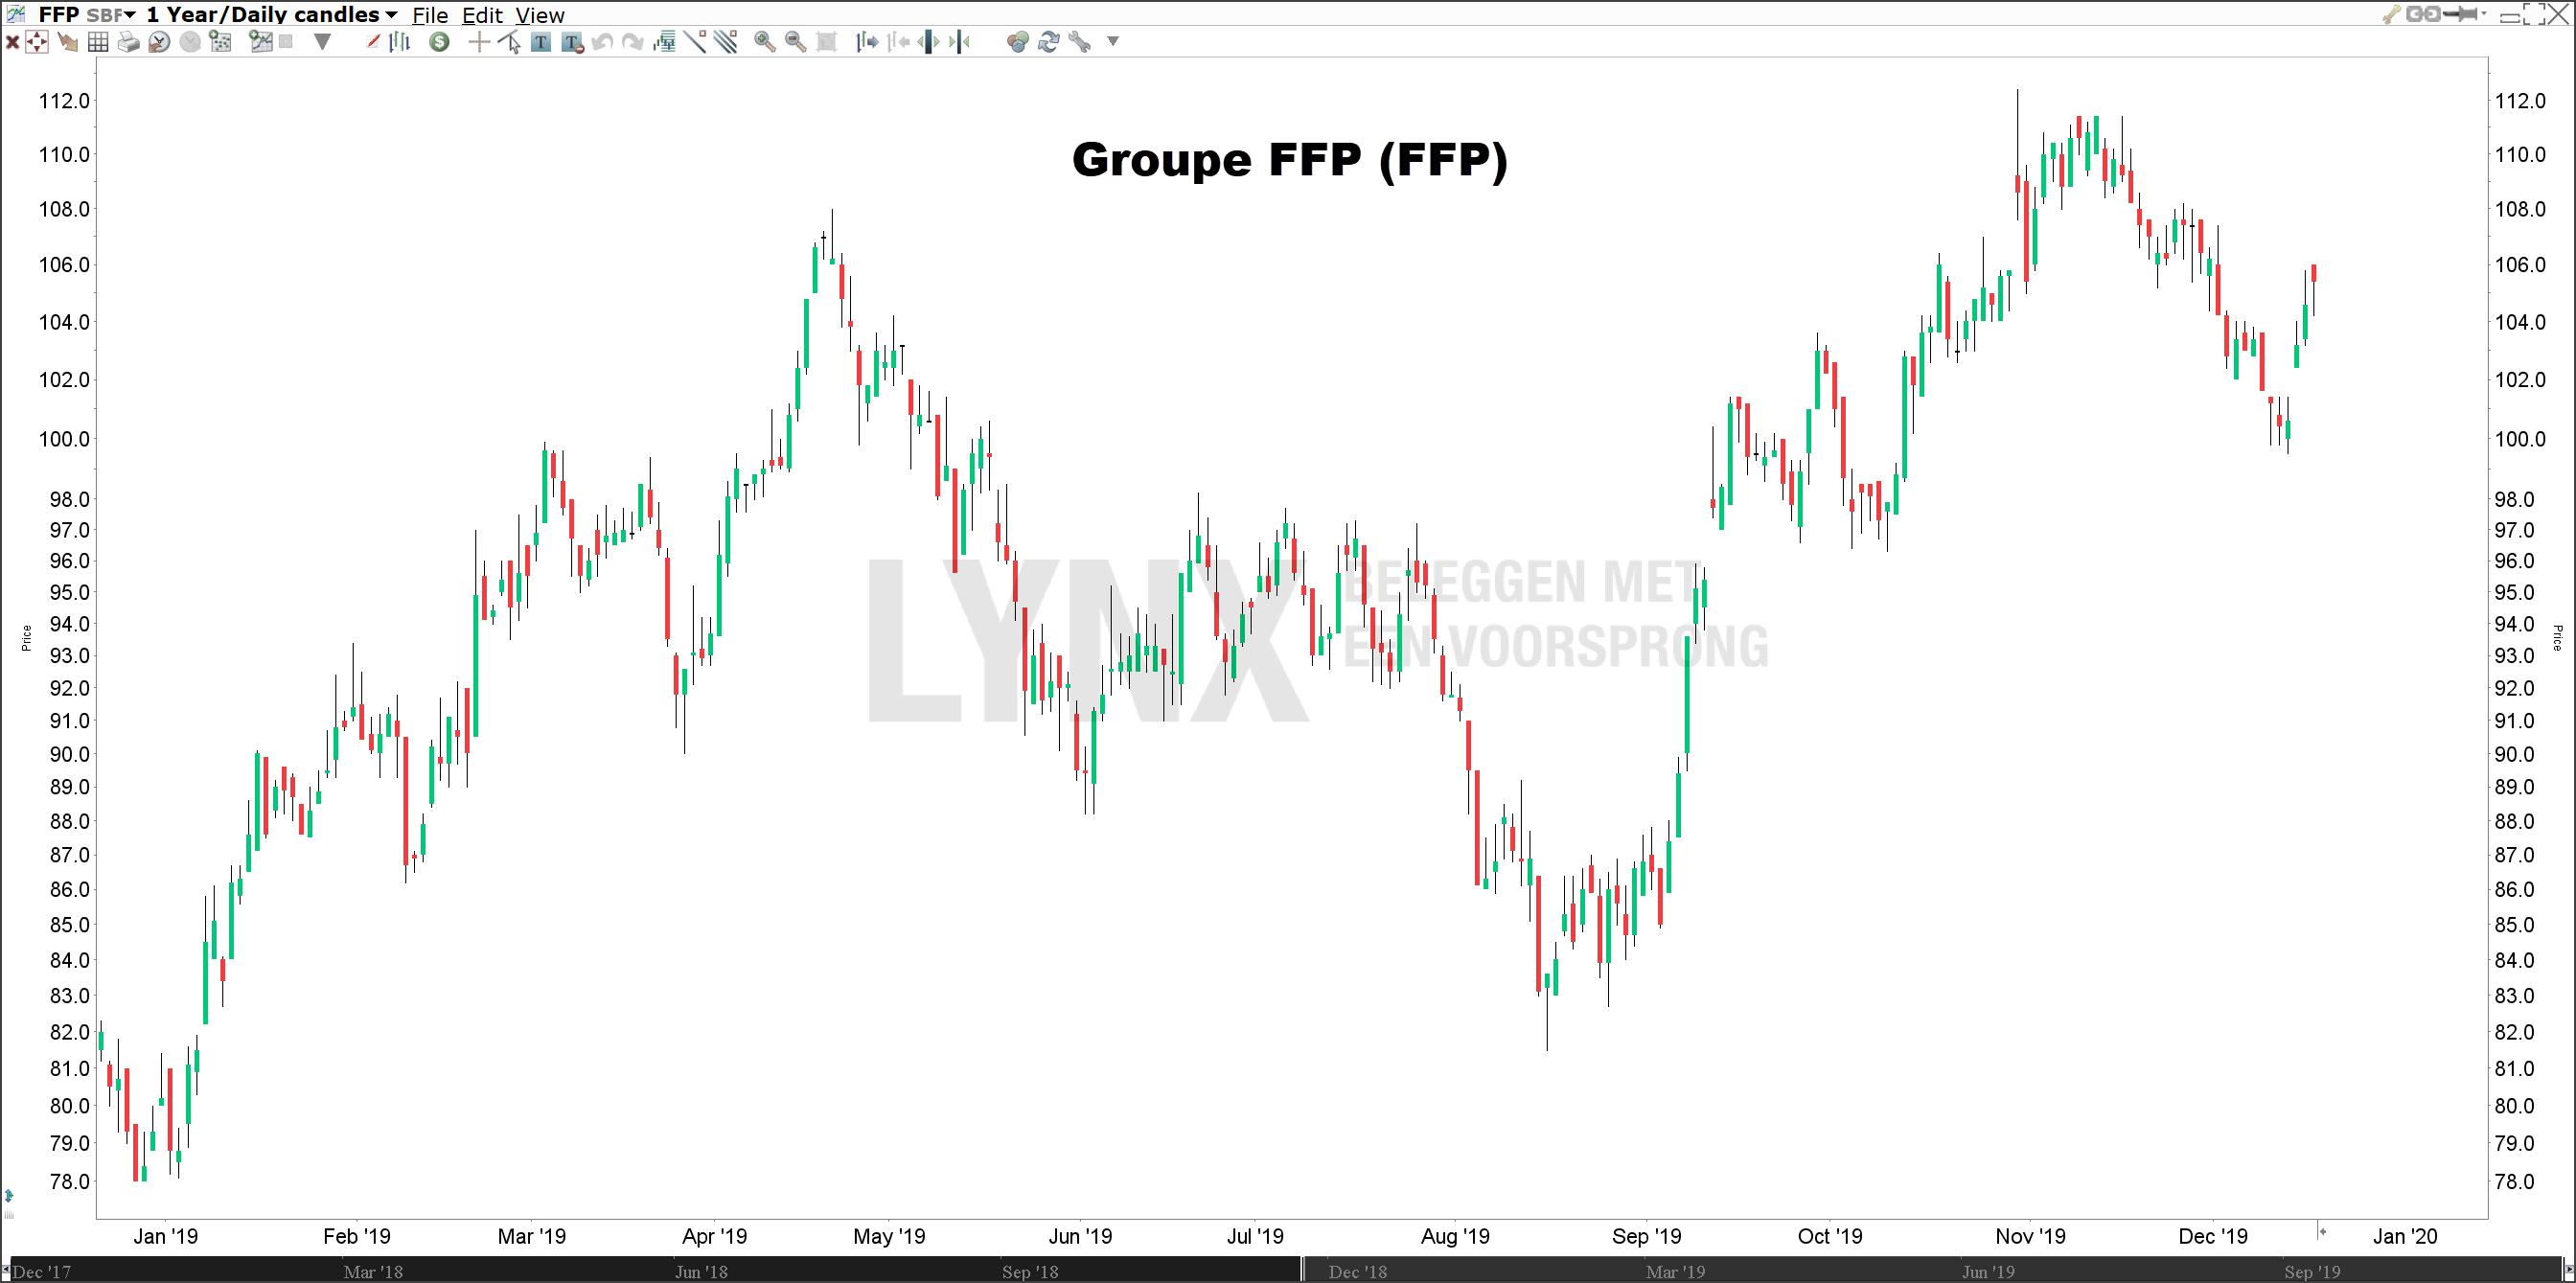 Koers Groupe FFP beste aandeel 2020